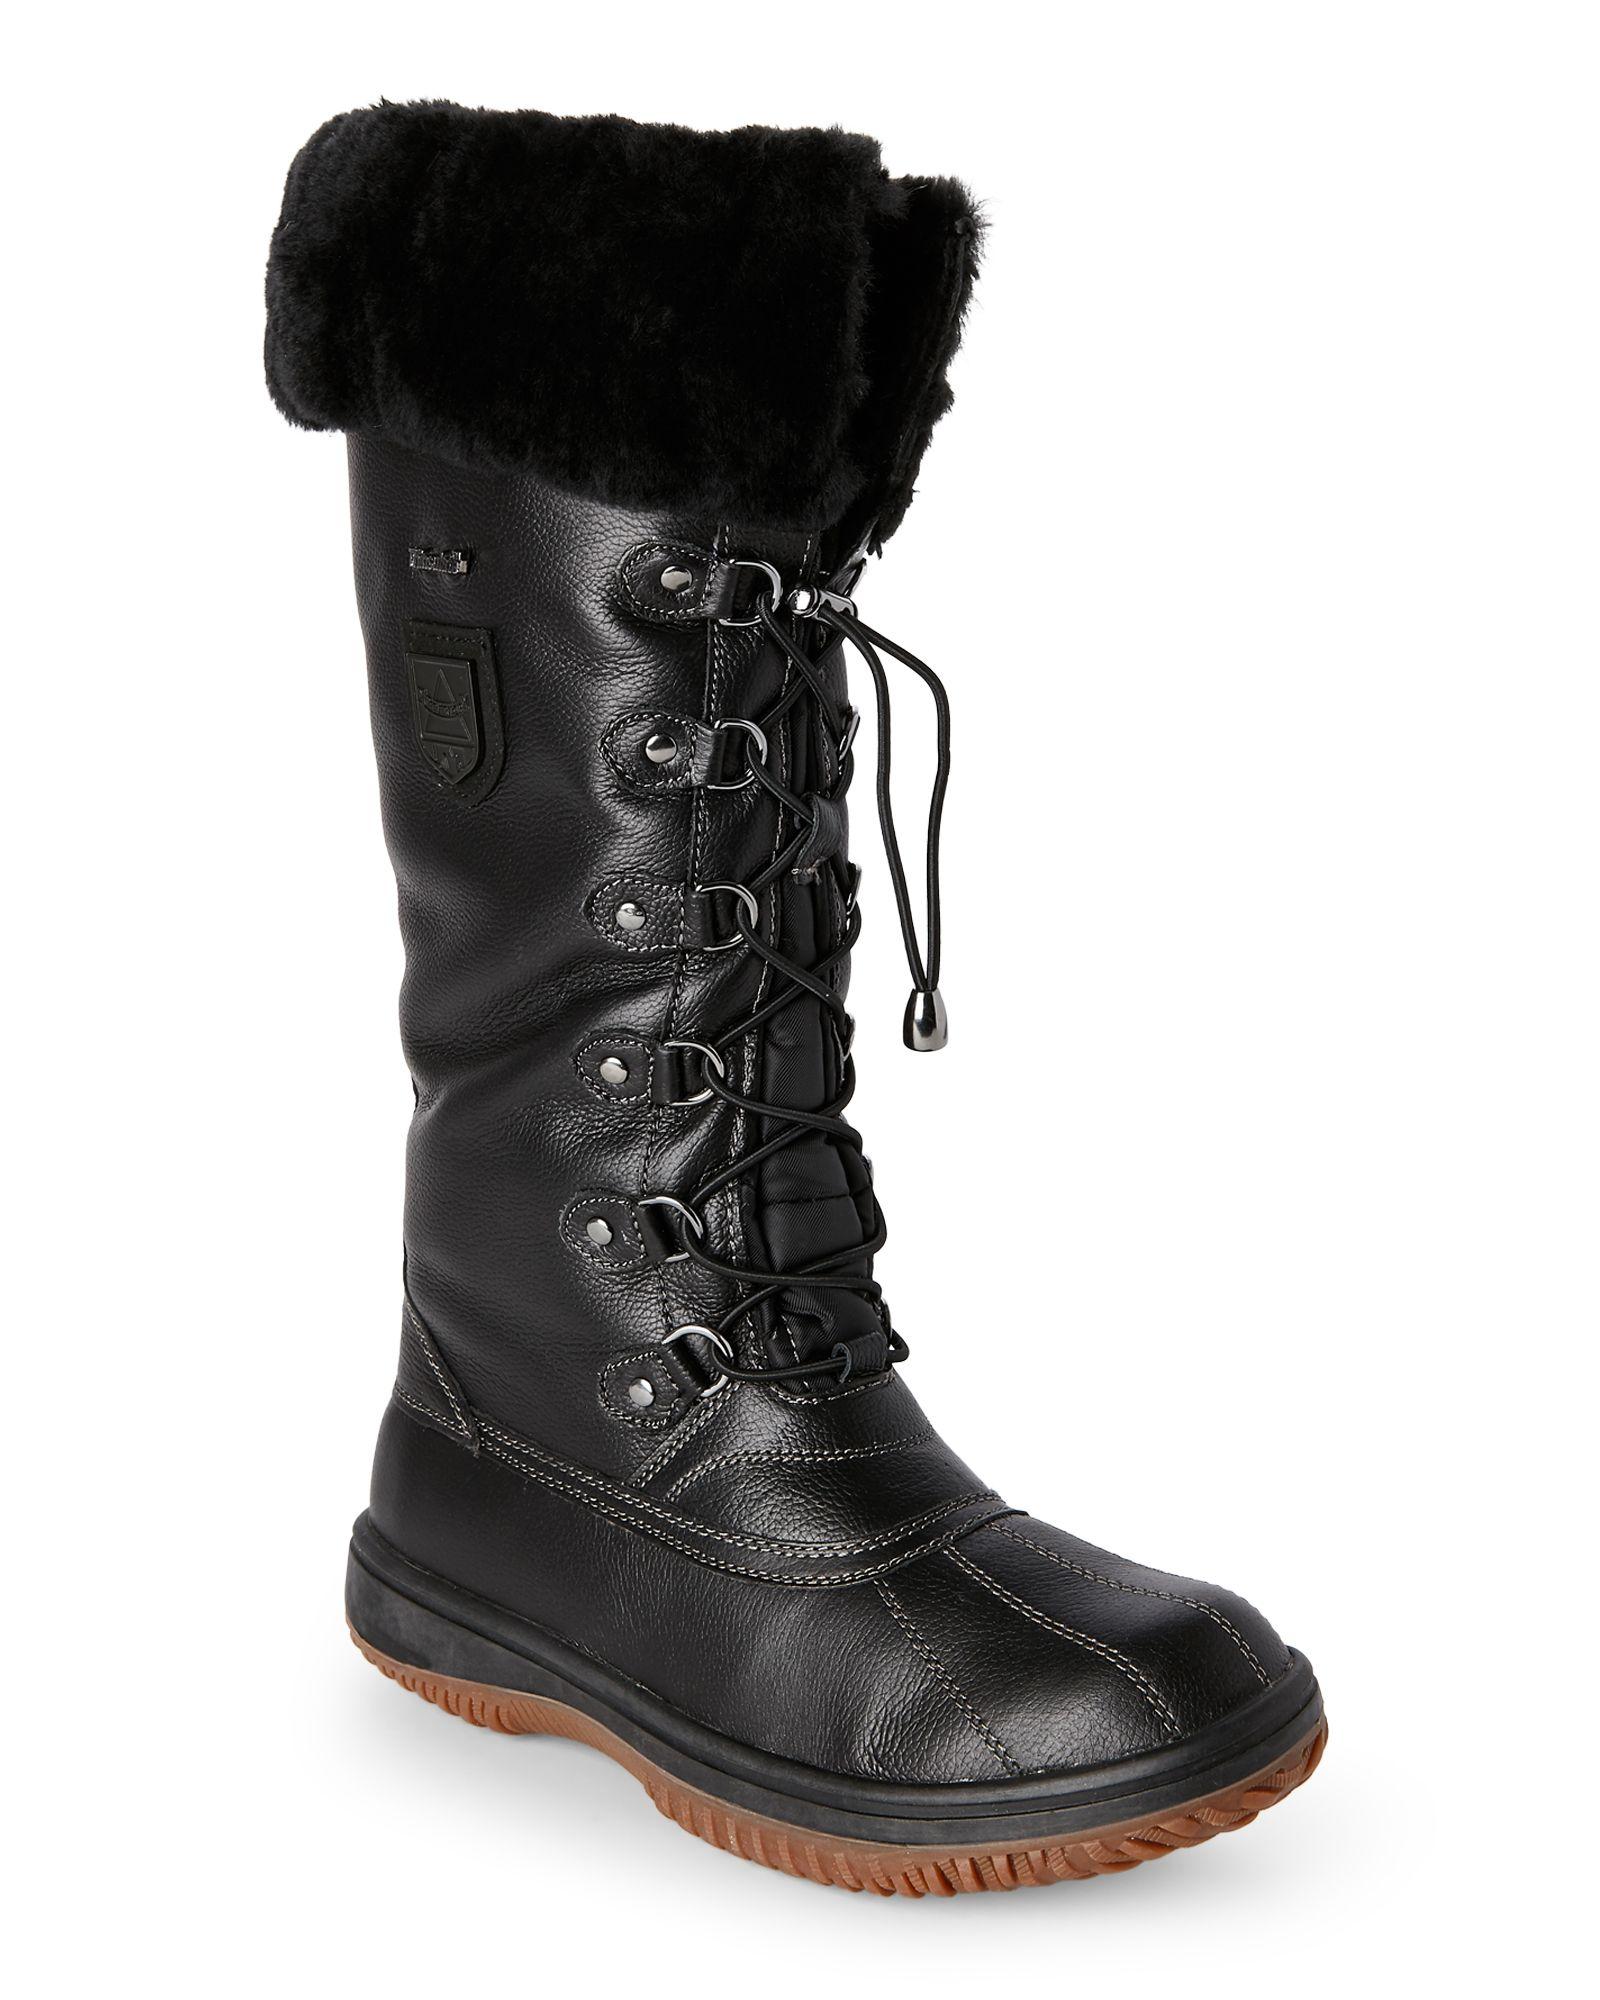 b7f056b3d00 Atelier Noir By Rudsak Black Tall Snow Boots